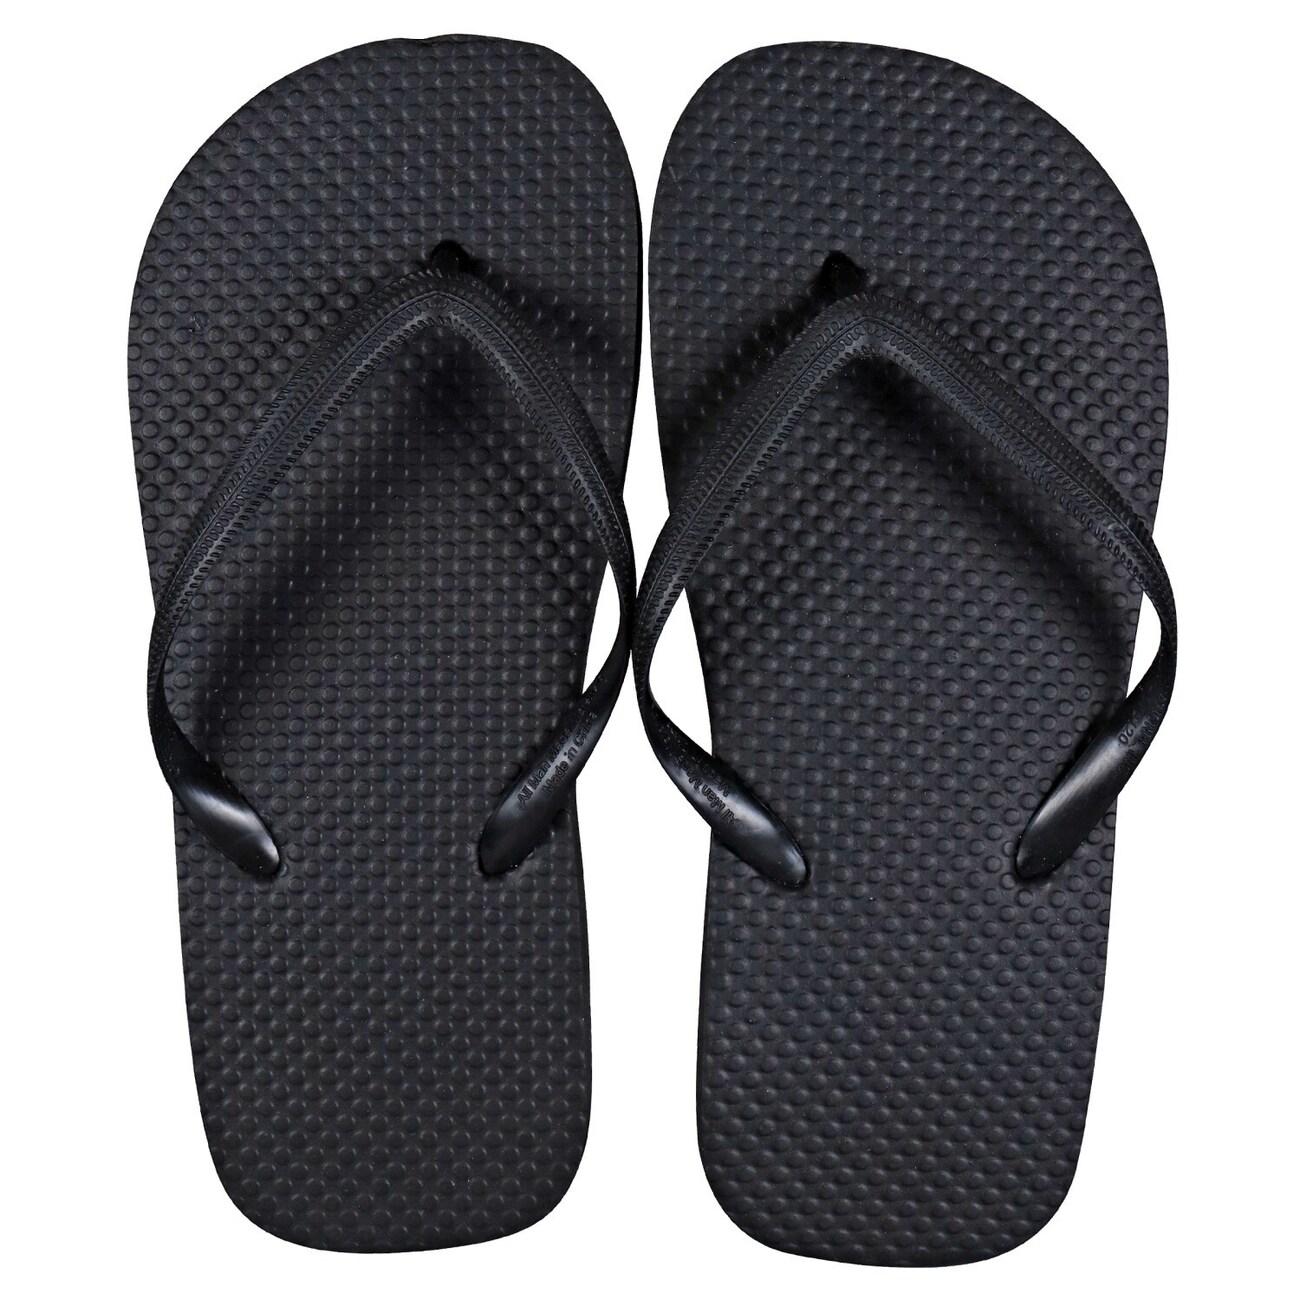 aed5aa246 Kids  Solid Black Rubber Flip Flops